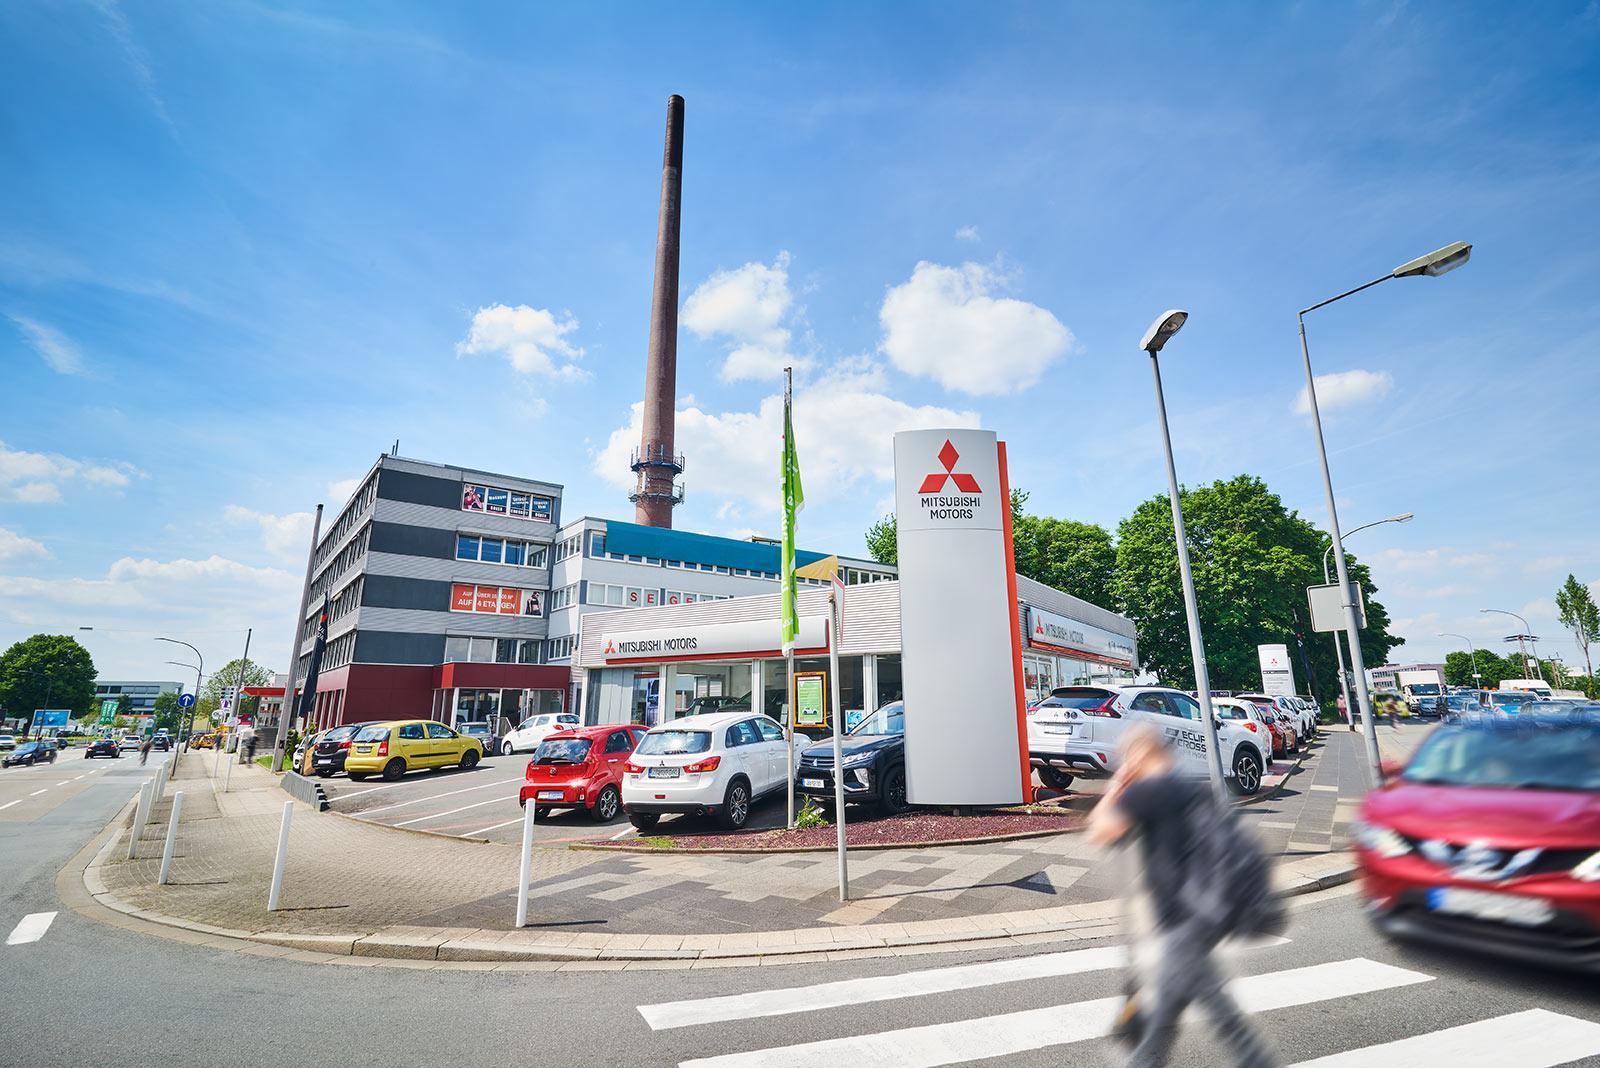 Immobilie in Essen (Frohnhausen): Multi-Tenant: Fitnessstudio, Büros, Autohandel, Segeltuchmacherei